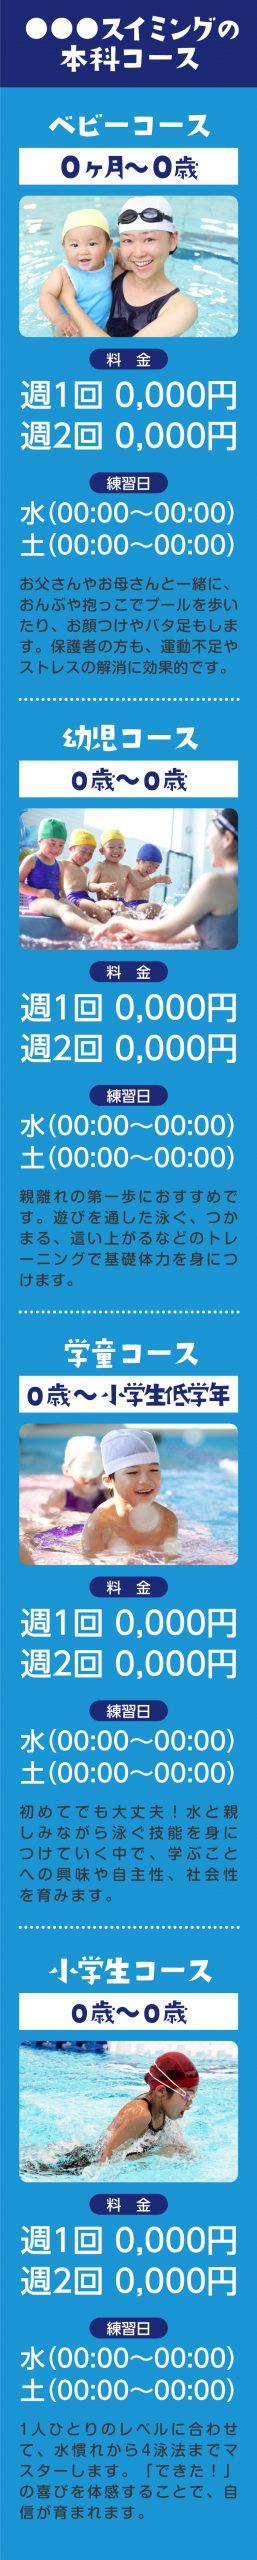 cv-case-ch-20h_b-02-2